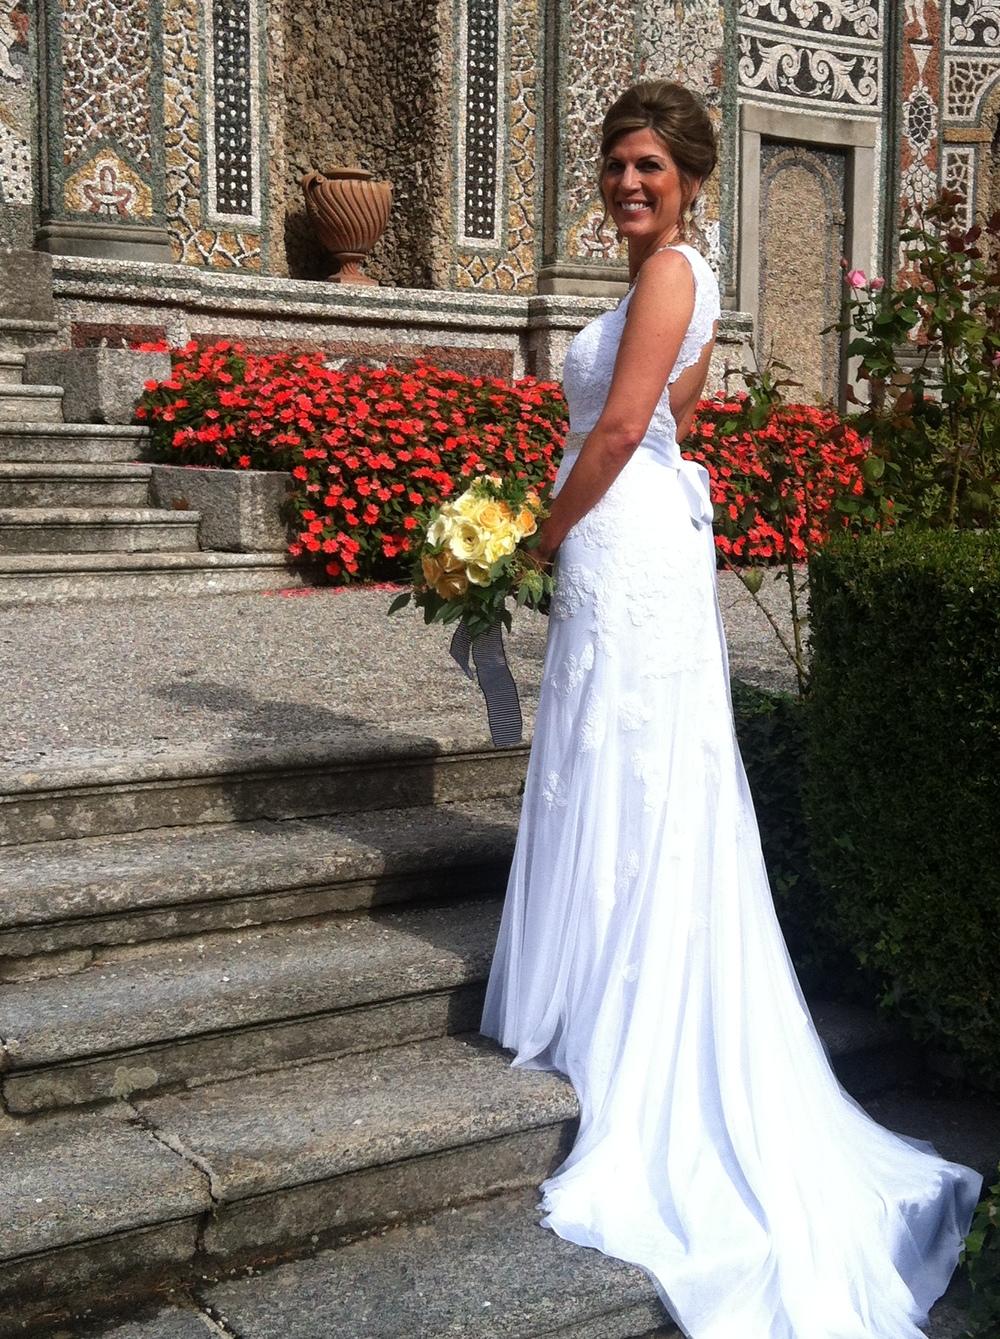 Isabel Wedding Day 9.16.13